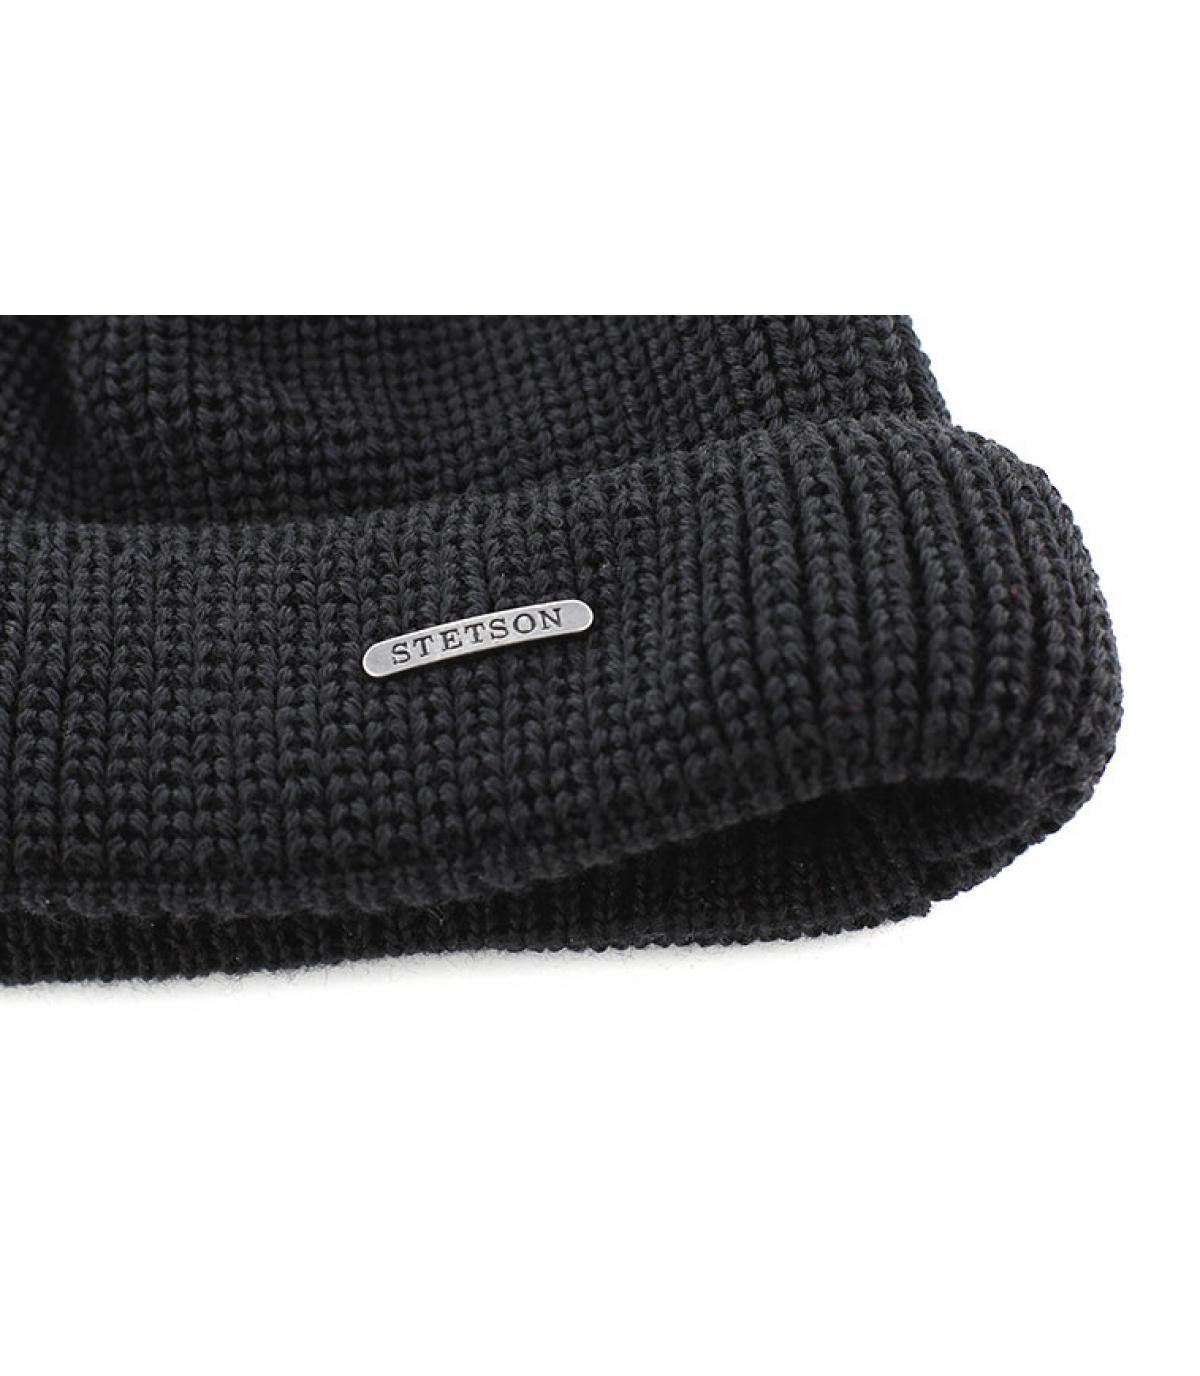 Bonnet Stetson noir